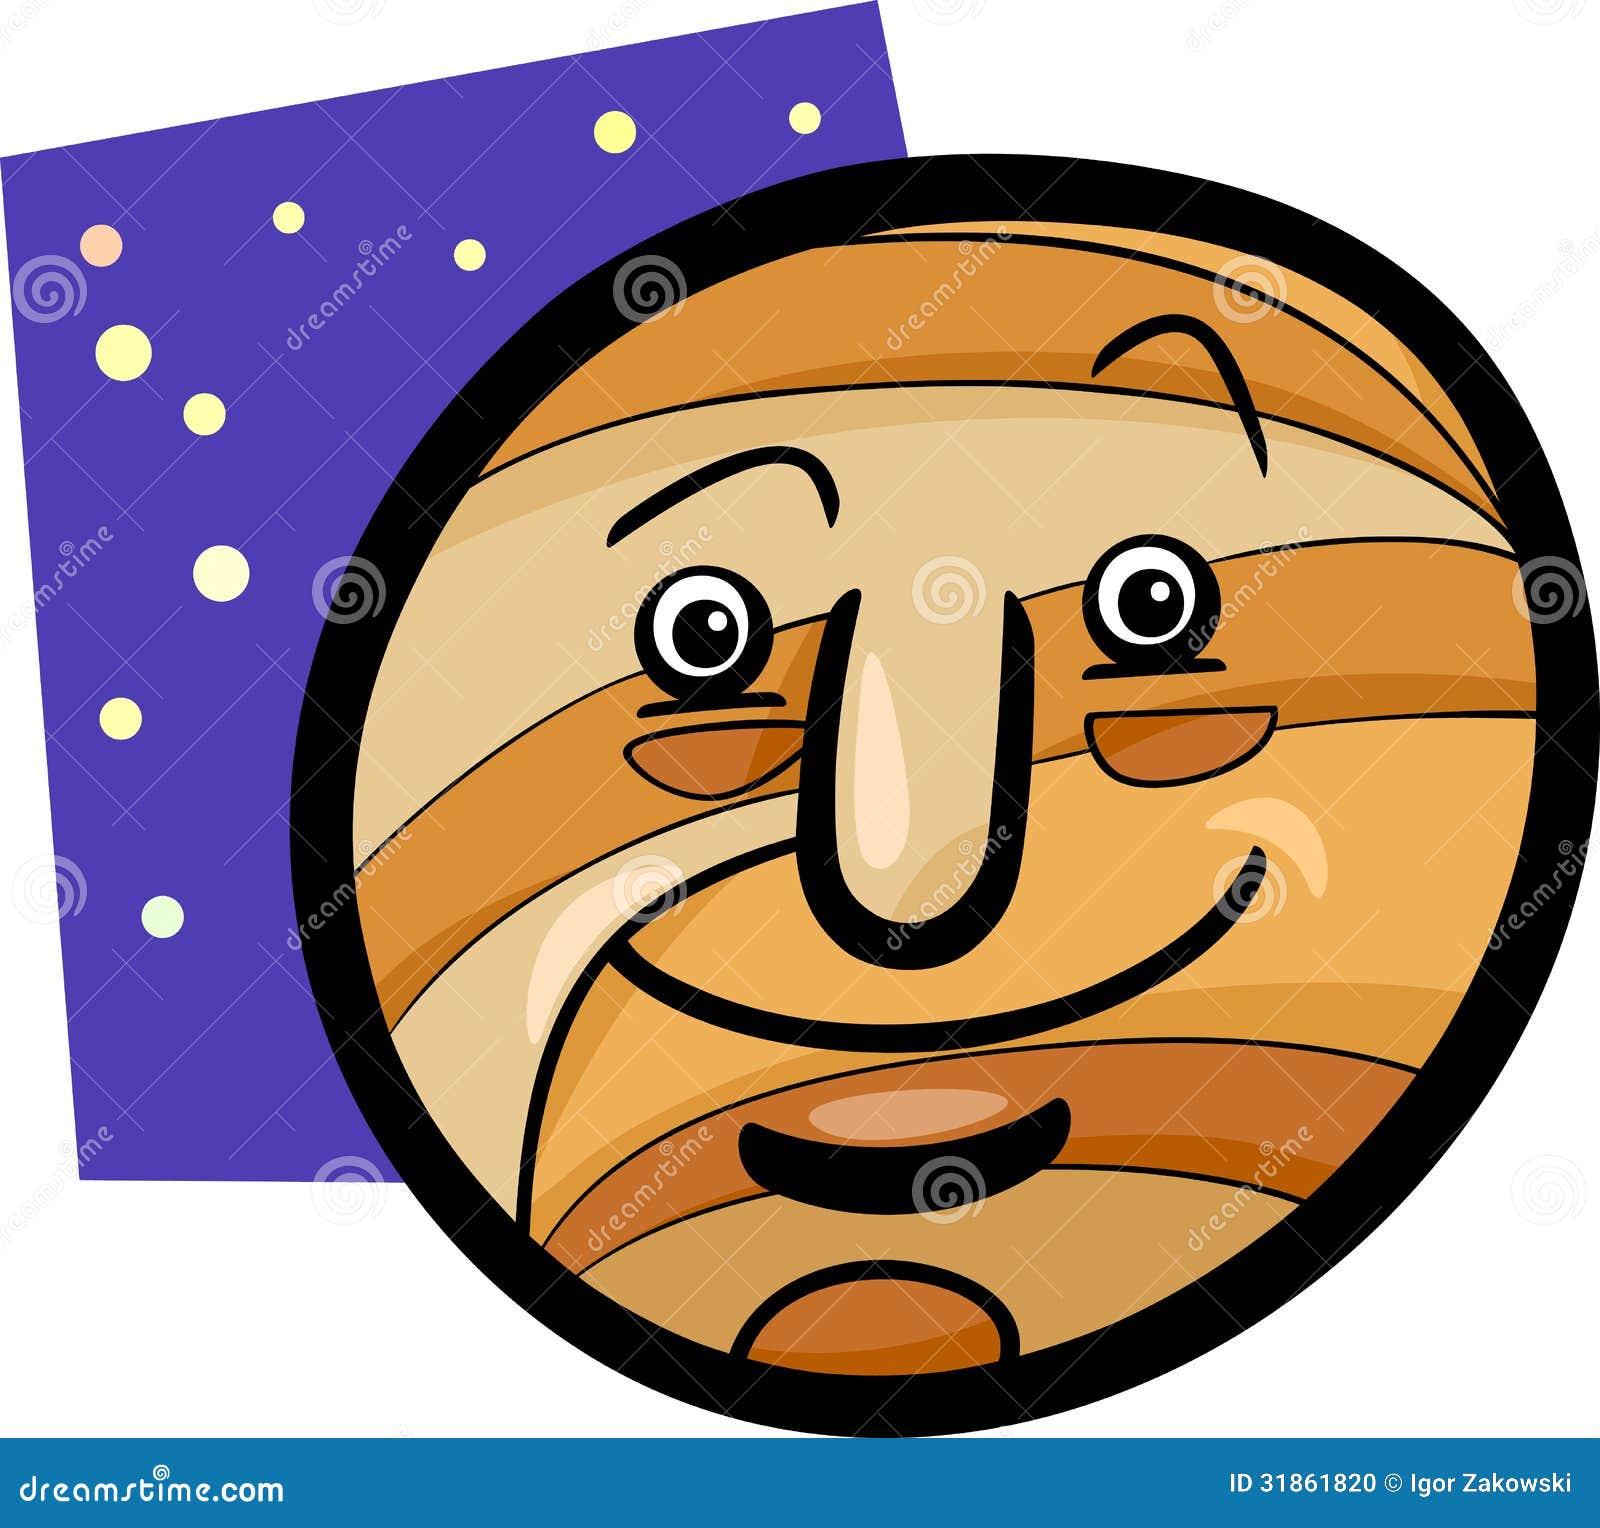 planet jupiter graphic - photo #36